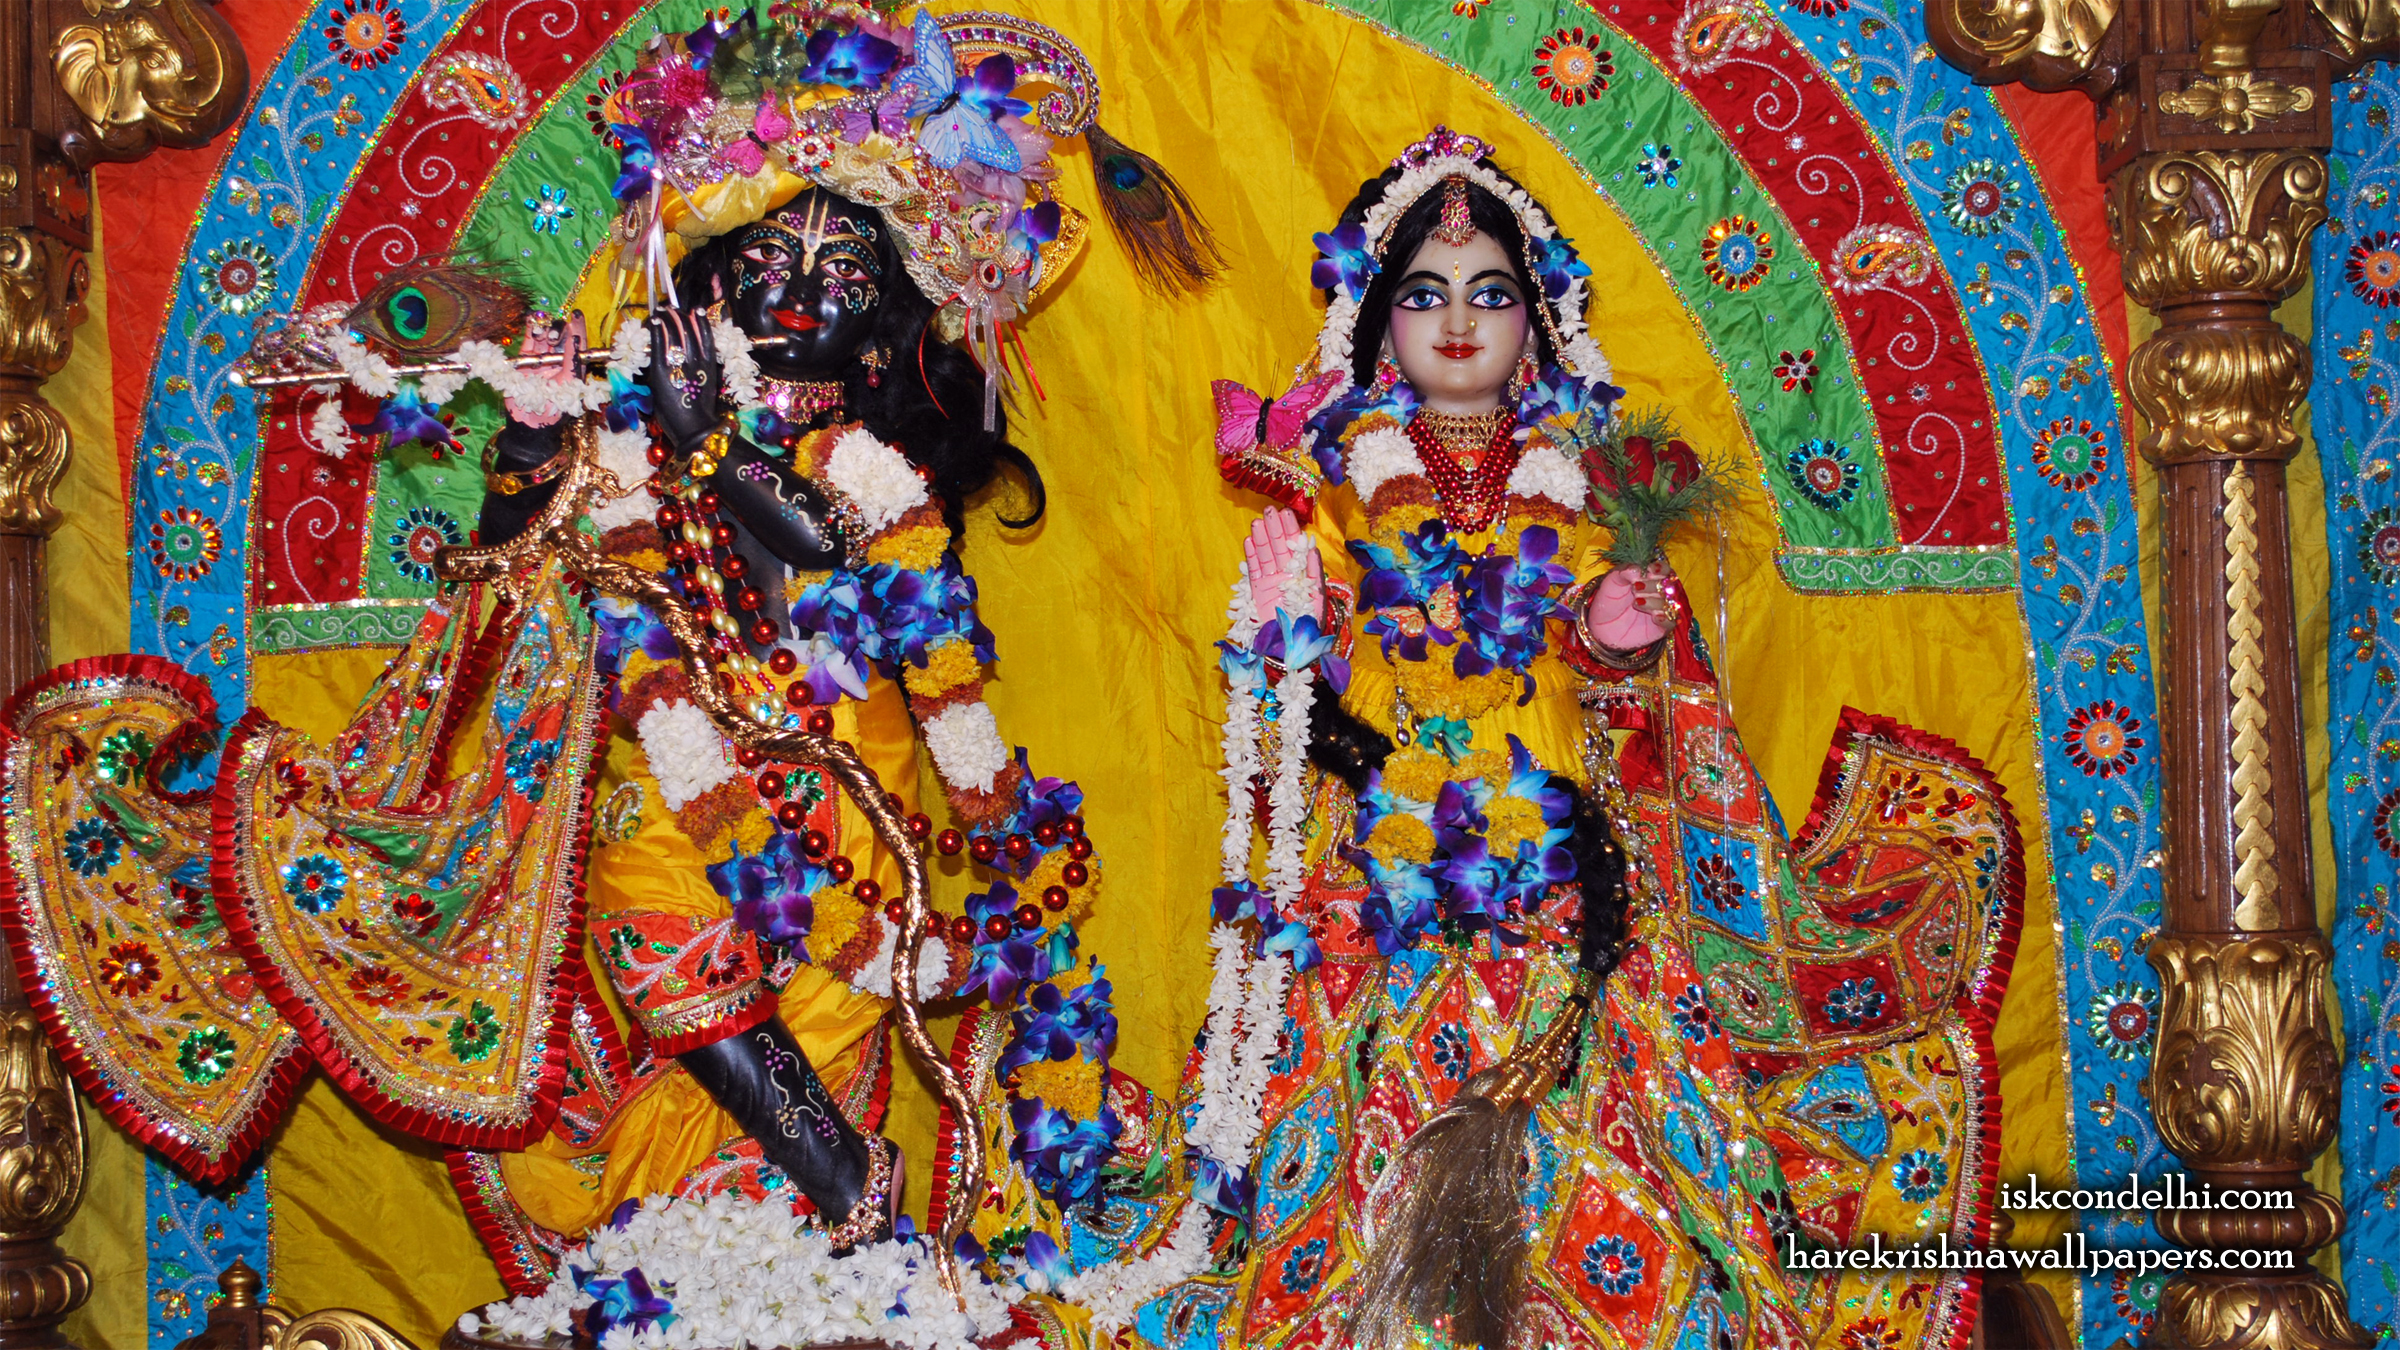 Sri Sri Radha Parthasarathi Wallpaper (012) Size 2400x1350 Download